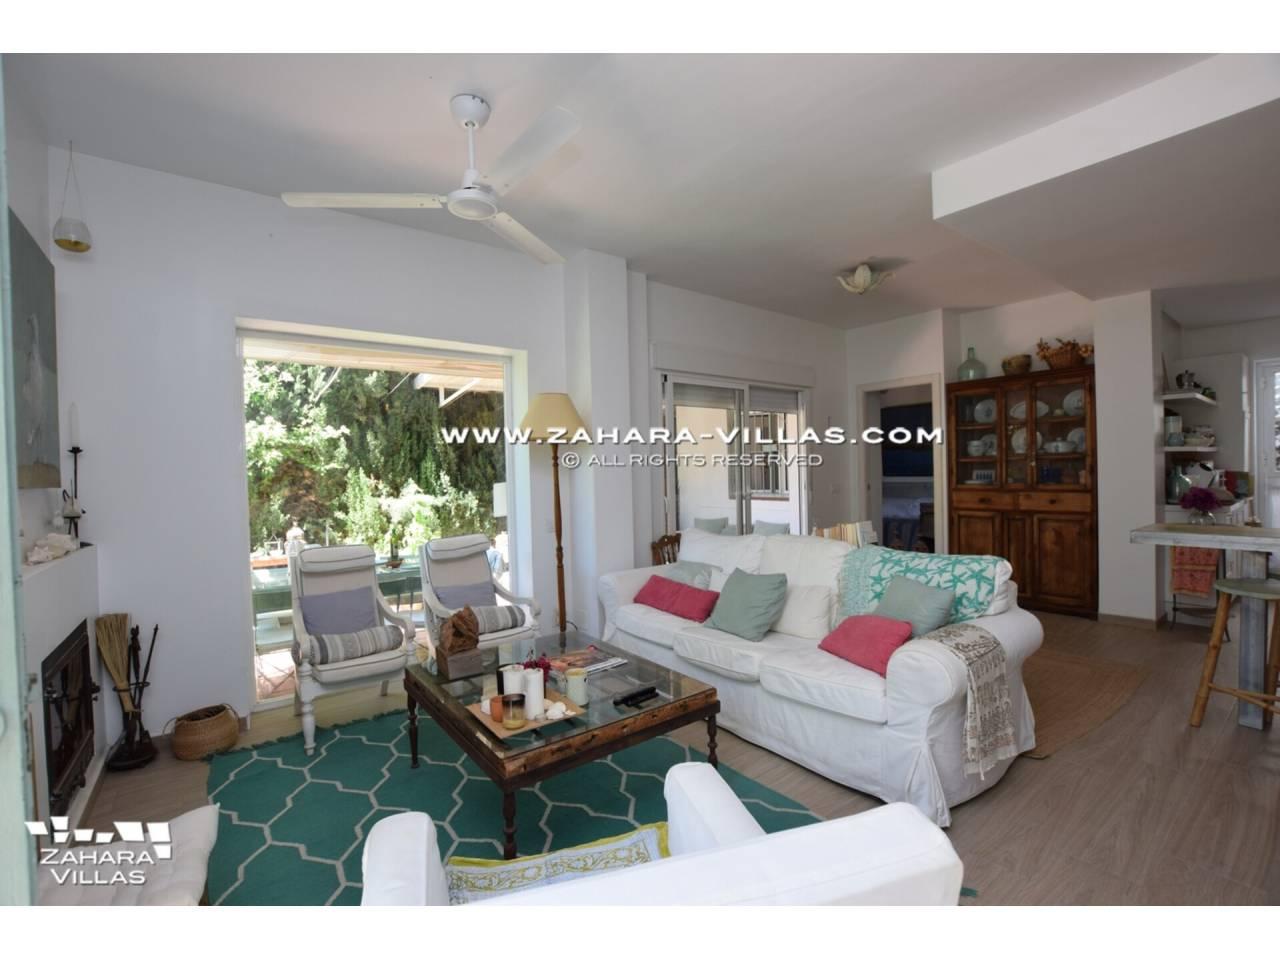 Imagen 10 de House for sale close to the beach, with sea views in Zahara de los Atunes